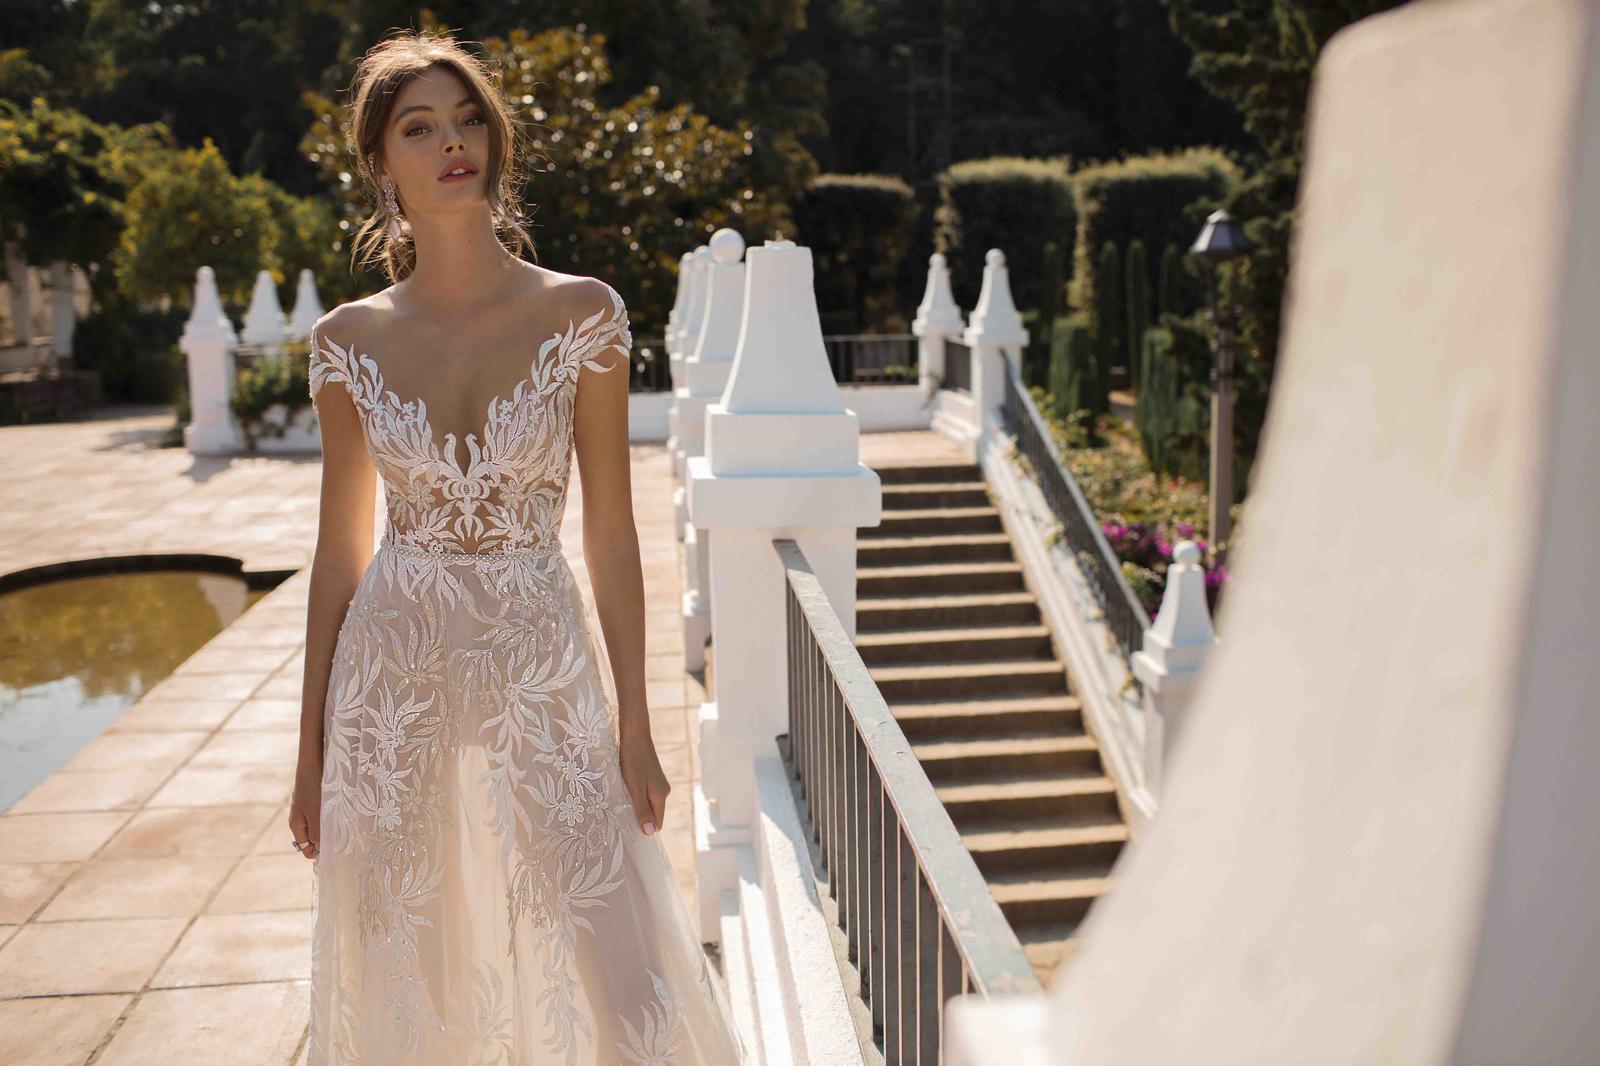 Muse by Berta * Svadobné šaty z kolekcií na rok 2019 - Obrázok č. 19